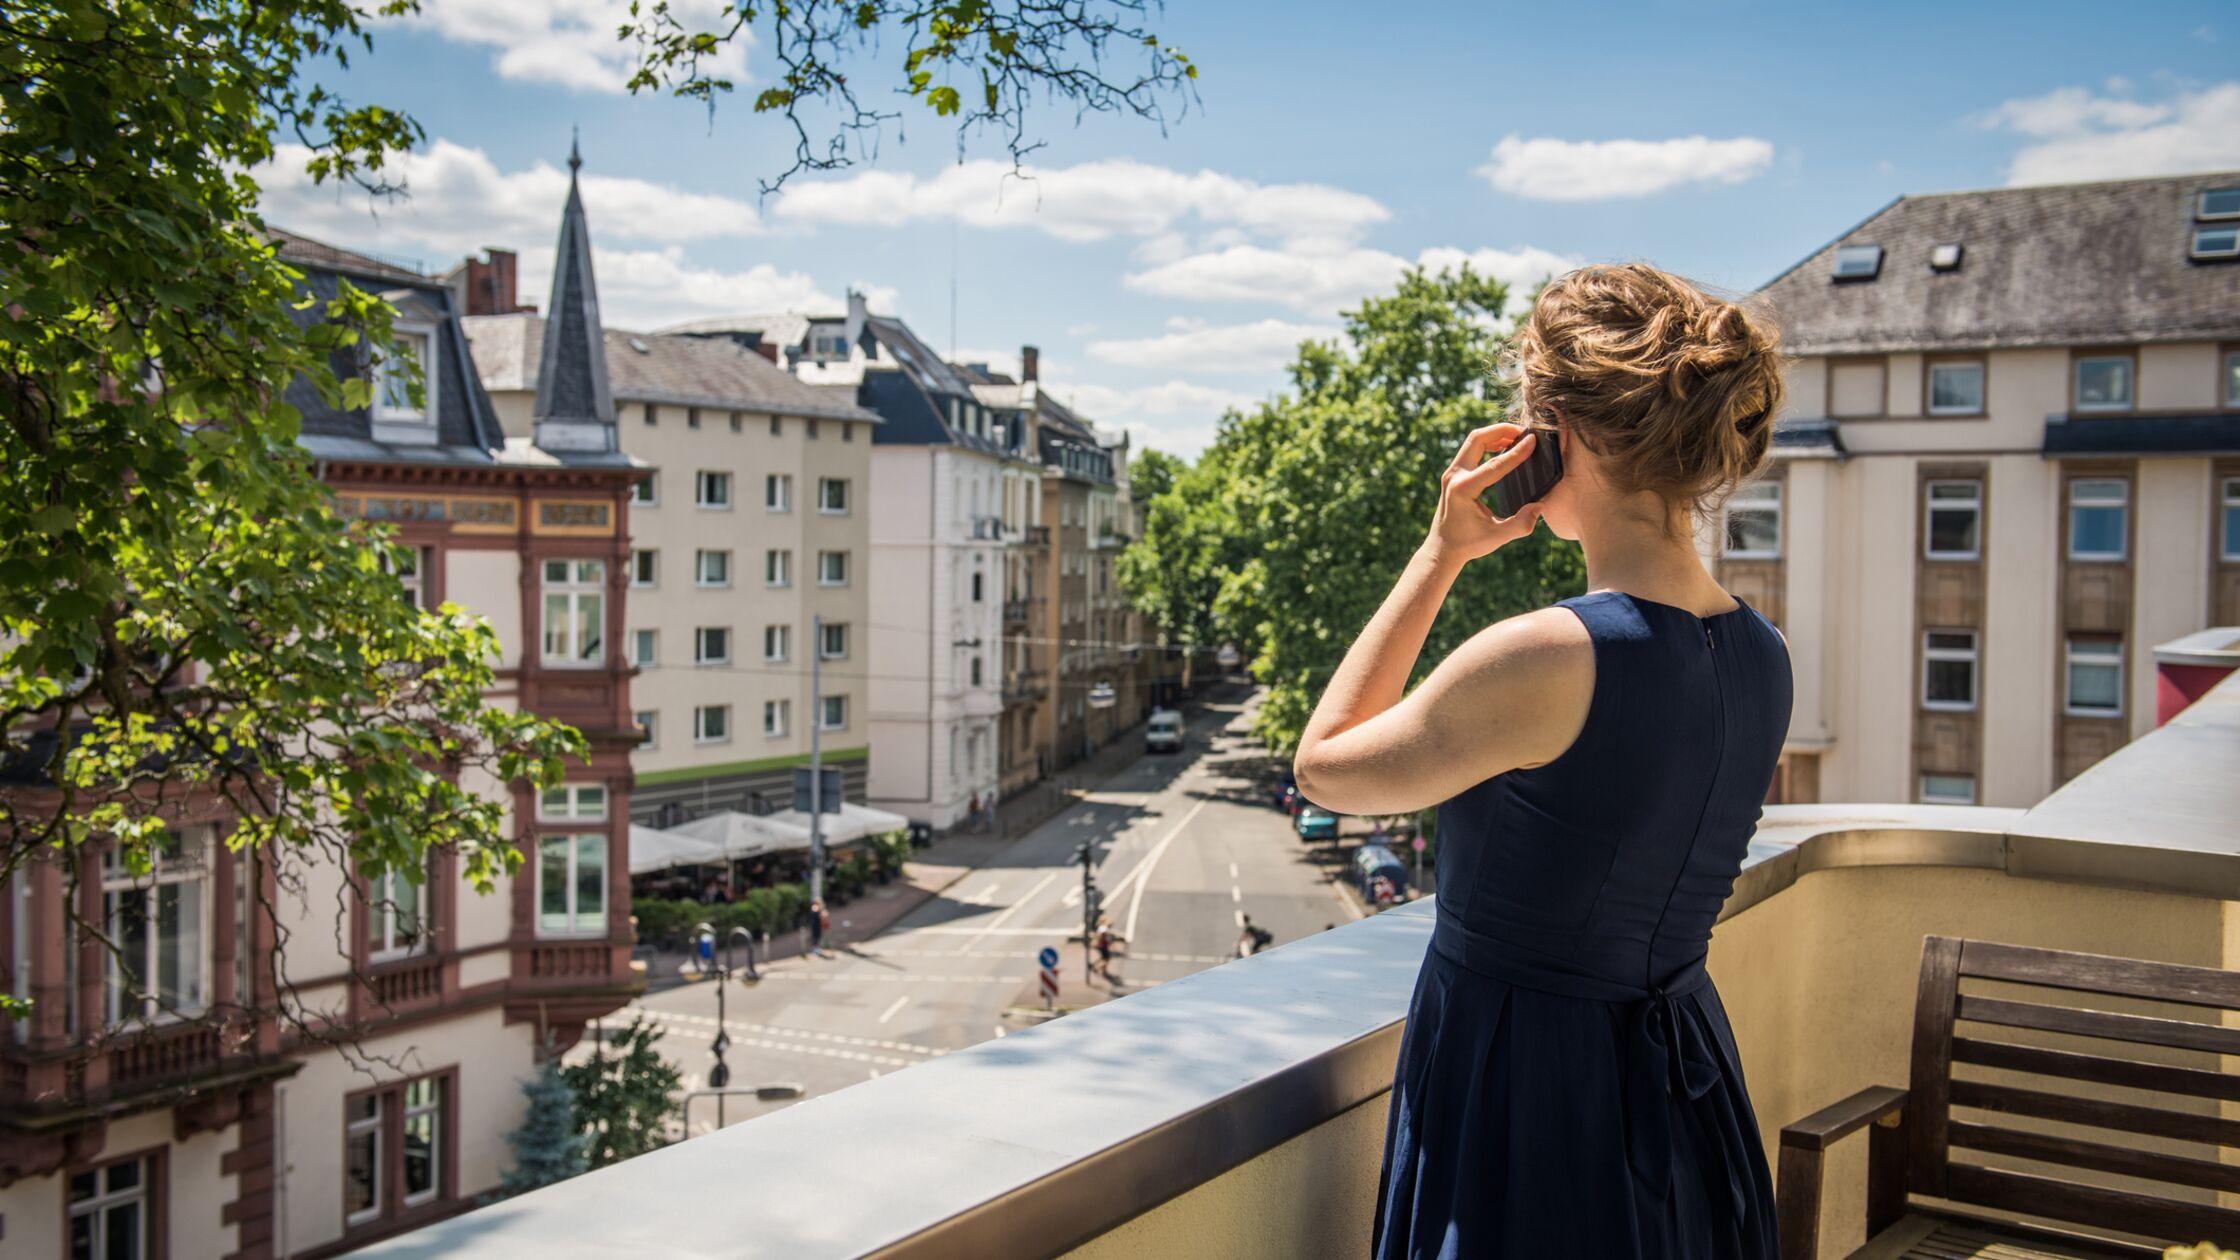 Junge Frau telefoniert auf dem Balkon